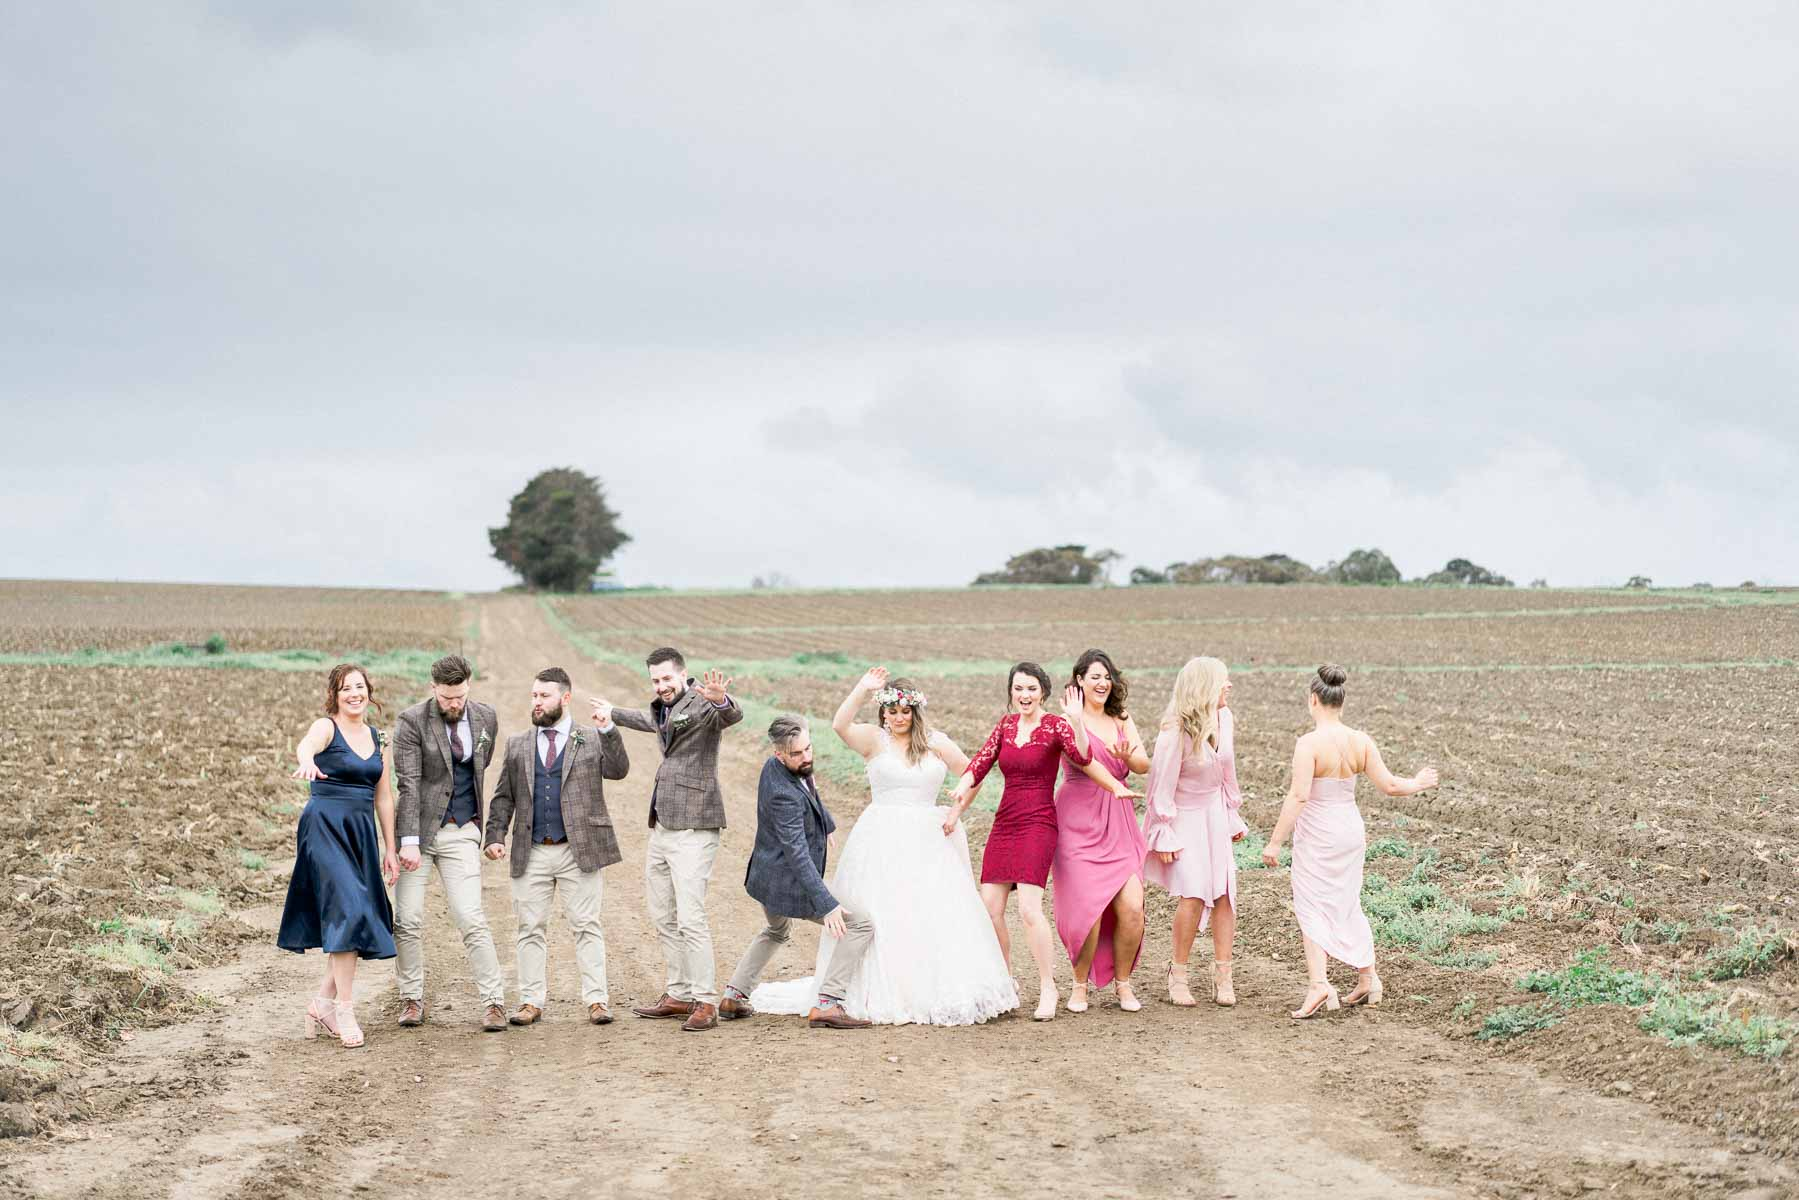 adams-farm-coldstream-yarra-valley-wedding-heart+soul-weddings-kel-jarryd-05586.jpg